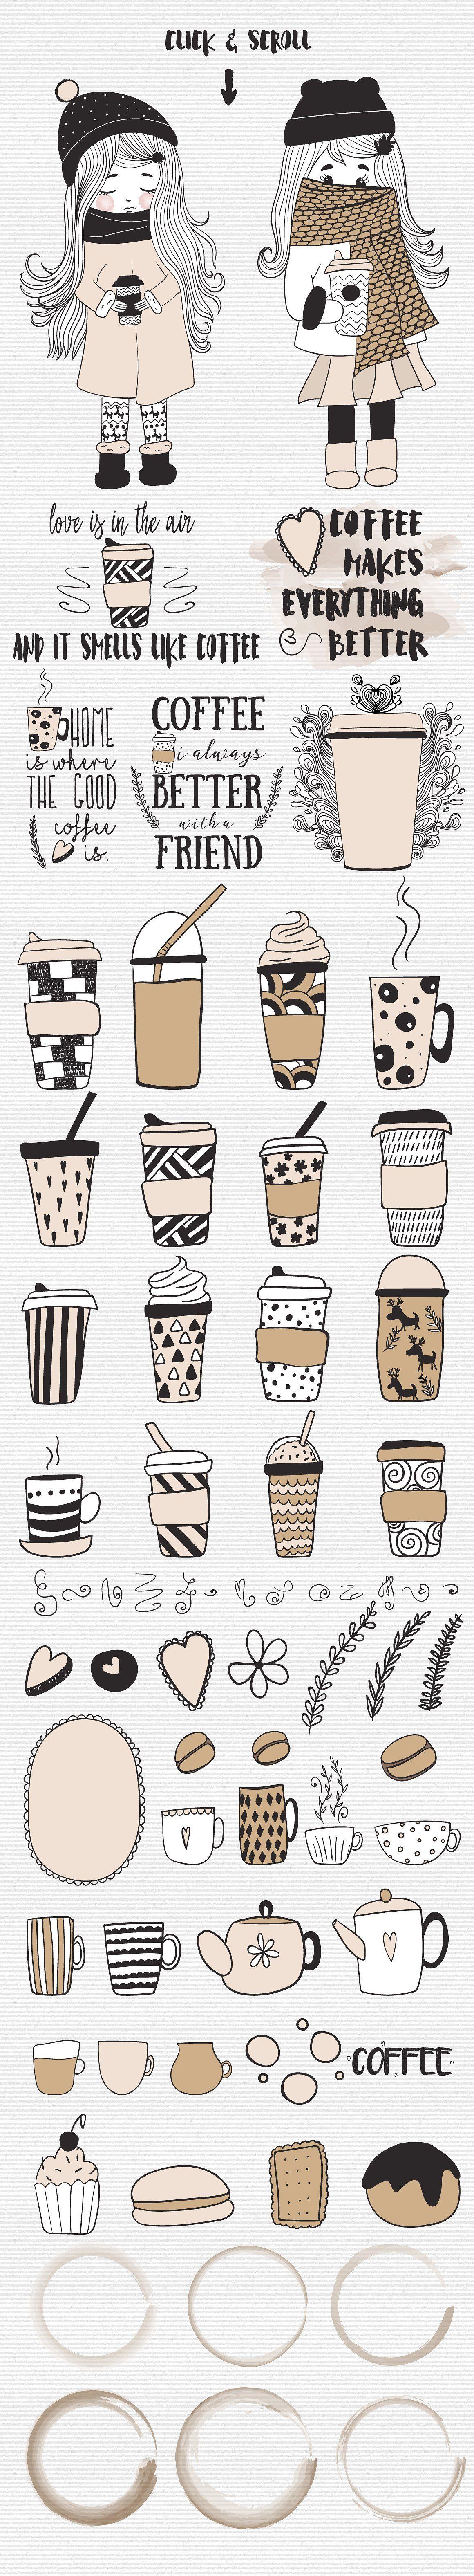 Coffee Doodle Set By Natdzho On Creativemarket Coffee Doodle Creative Market Doodles